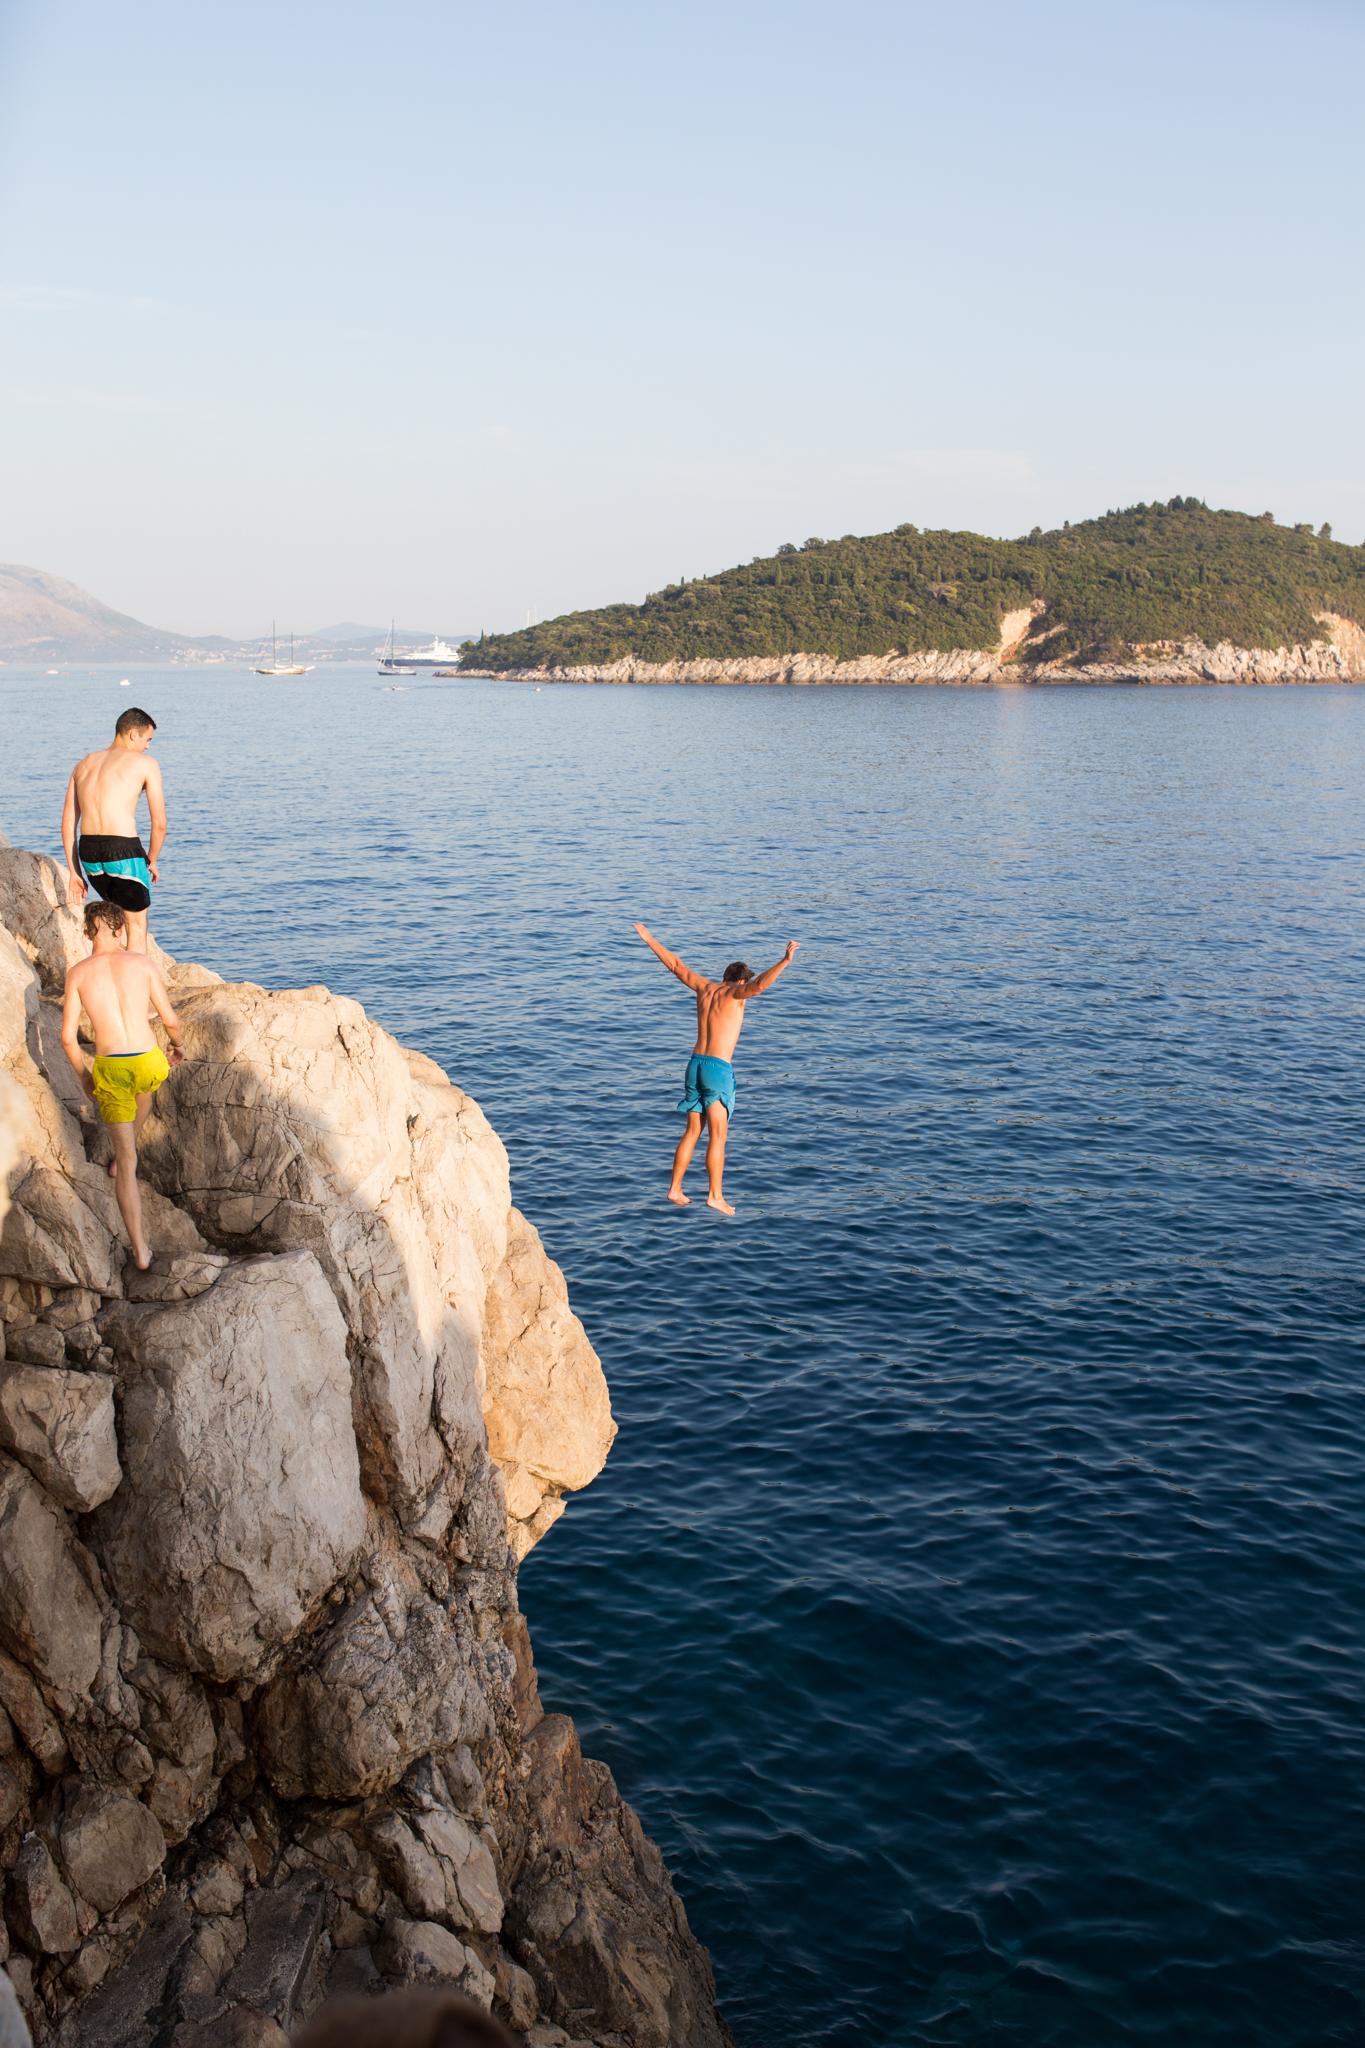 dubrovnik-croatia-dubrovnik hidden spots-dubrovnik beaches-cliff diving in dubrovnik-cliff diving in croatia-arose travels-alina mendoza-9645.jpg